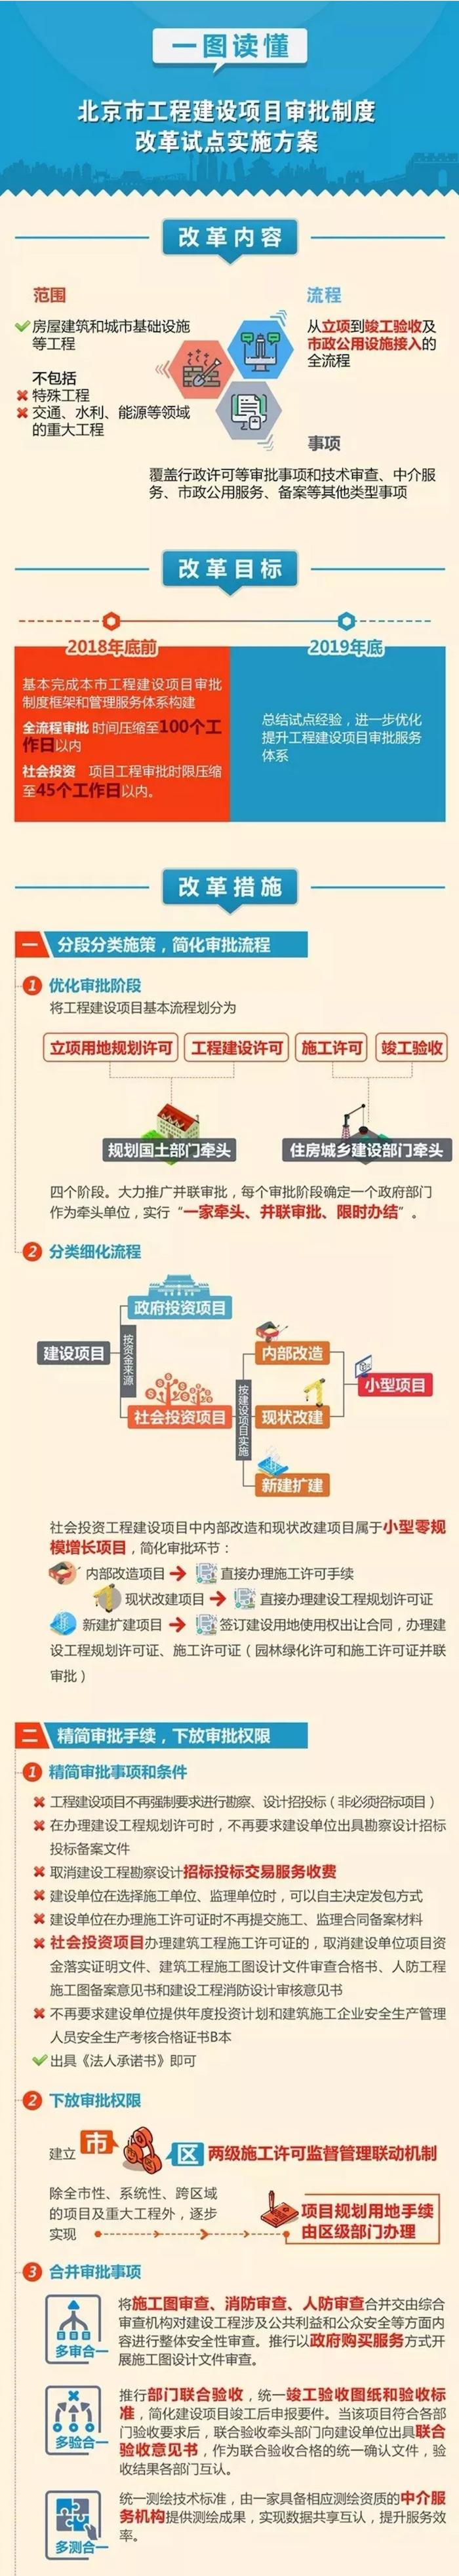 mp.weixin.qq.com_s_uUD-zlG7Raj3XUl_5WFZew(iPad Pro)01.jpg